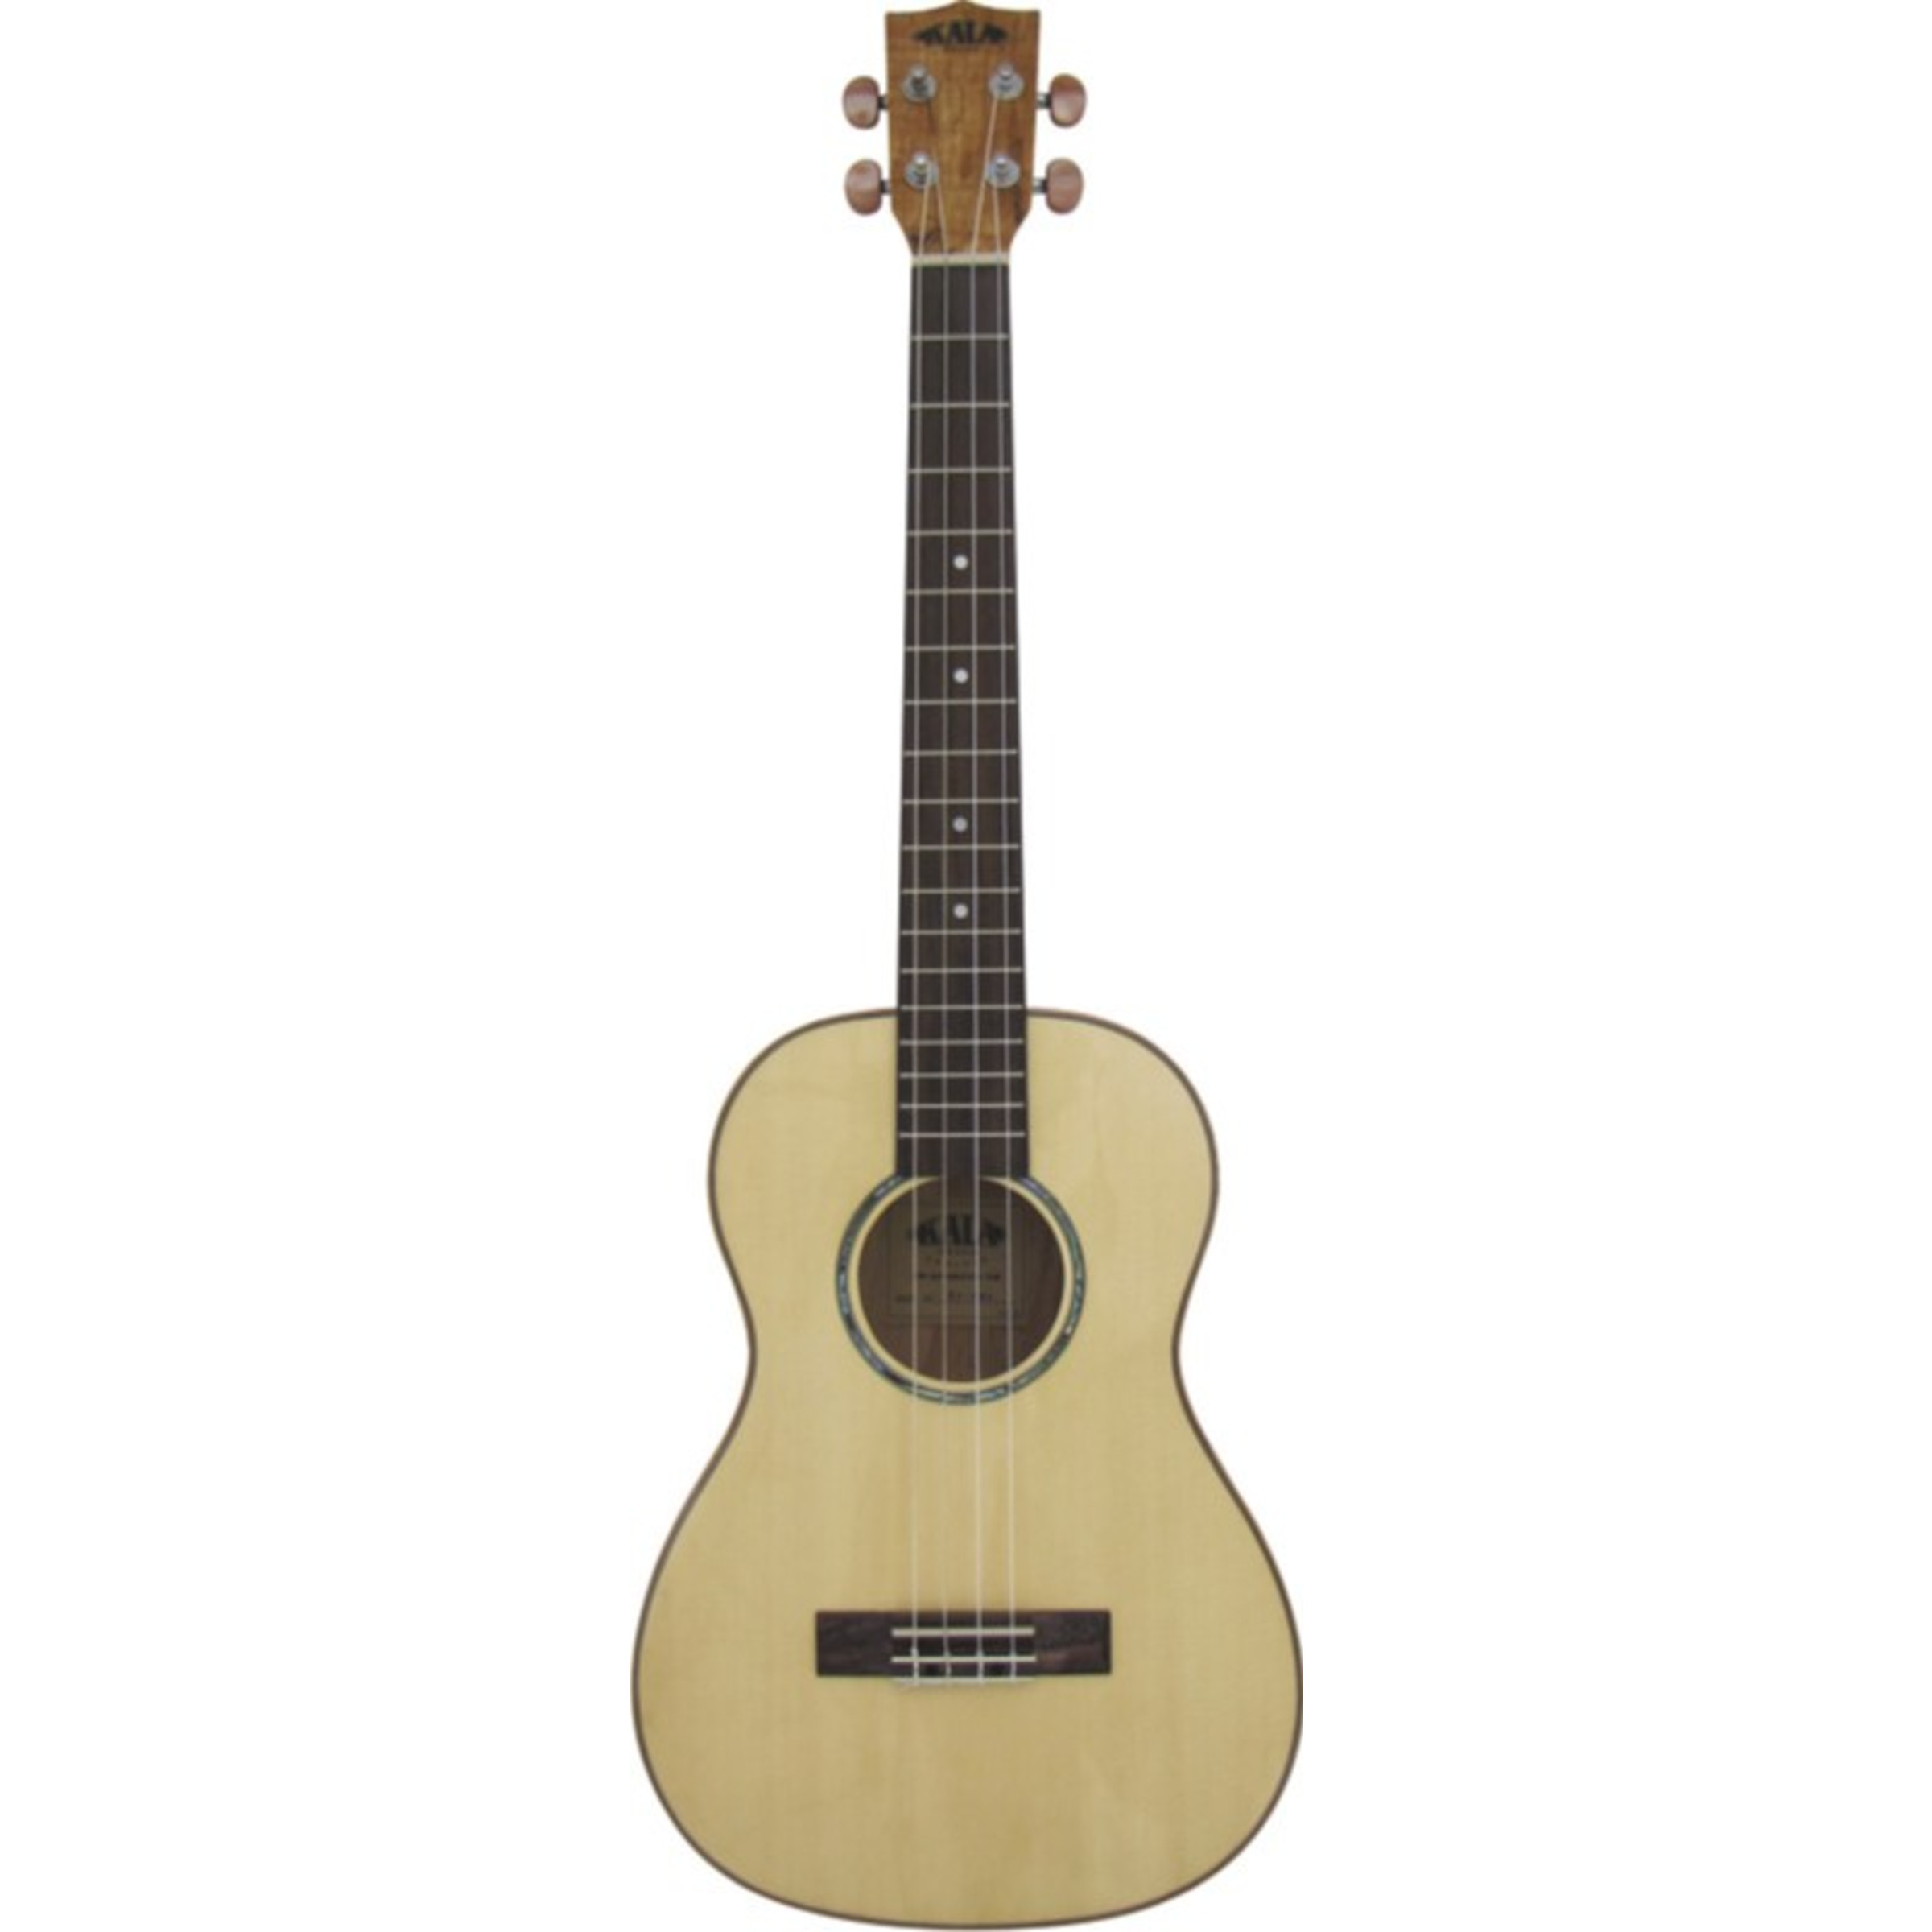 folk kala flame maple series ka fmb baritone ukulele giggear. Black Bedroom Furniture Sets. Home Design Ideas